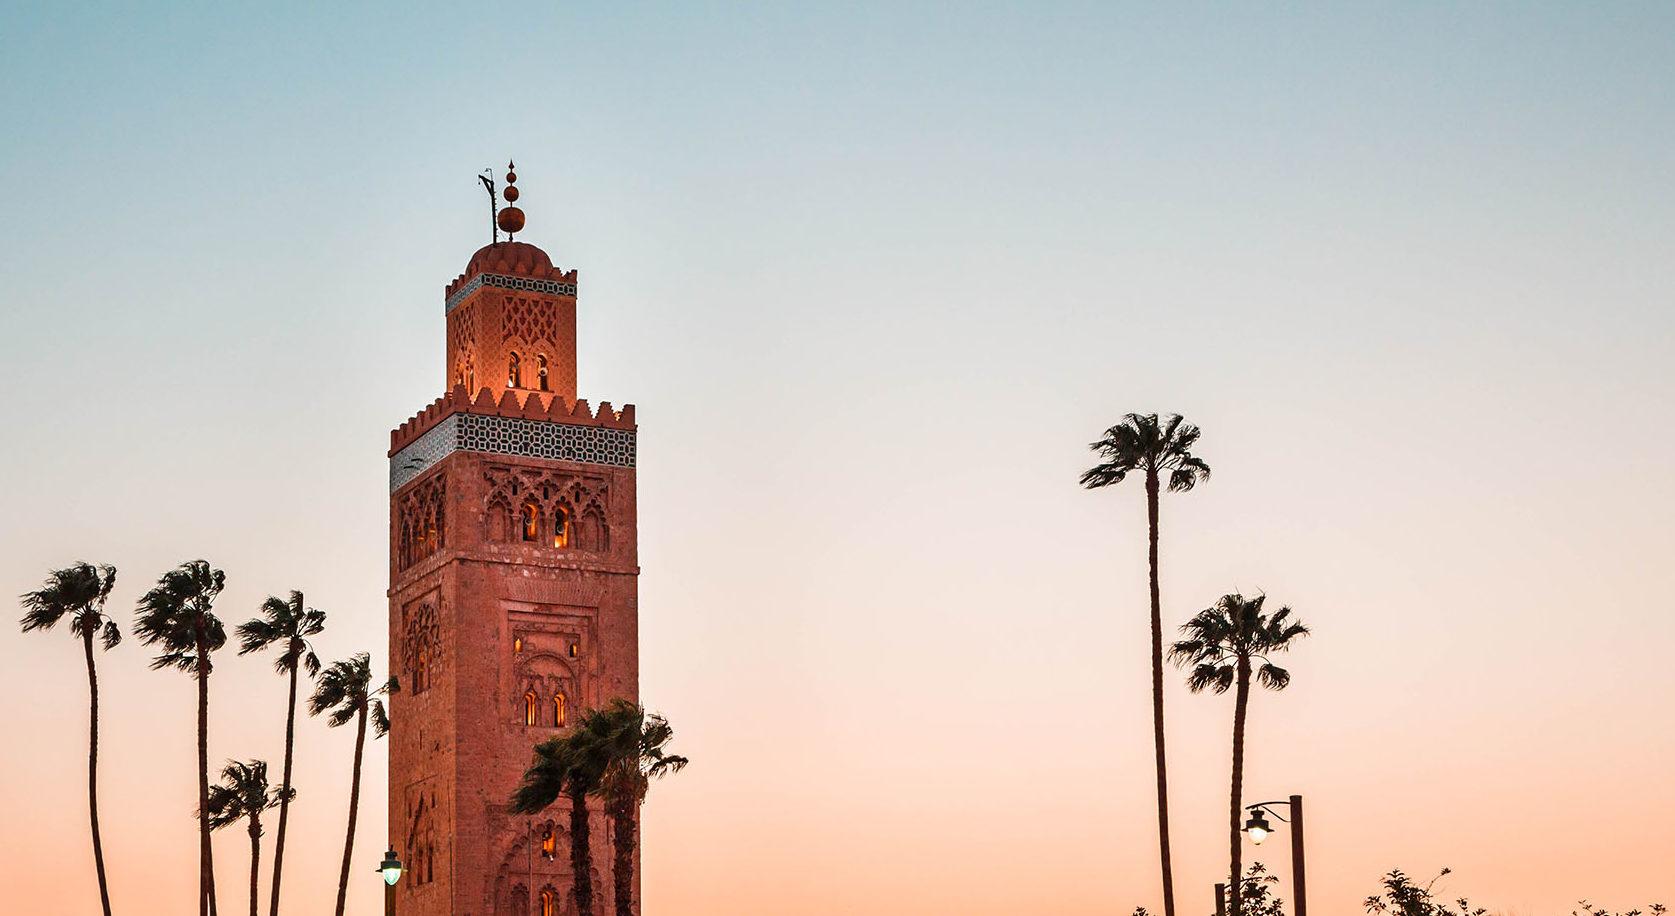 kamkamdunes-marrakech-tour